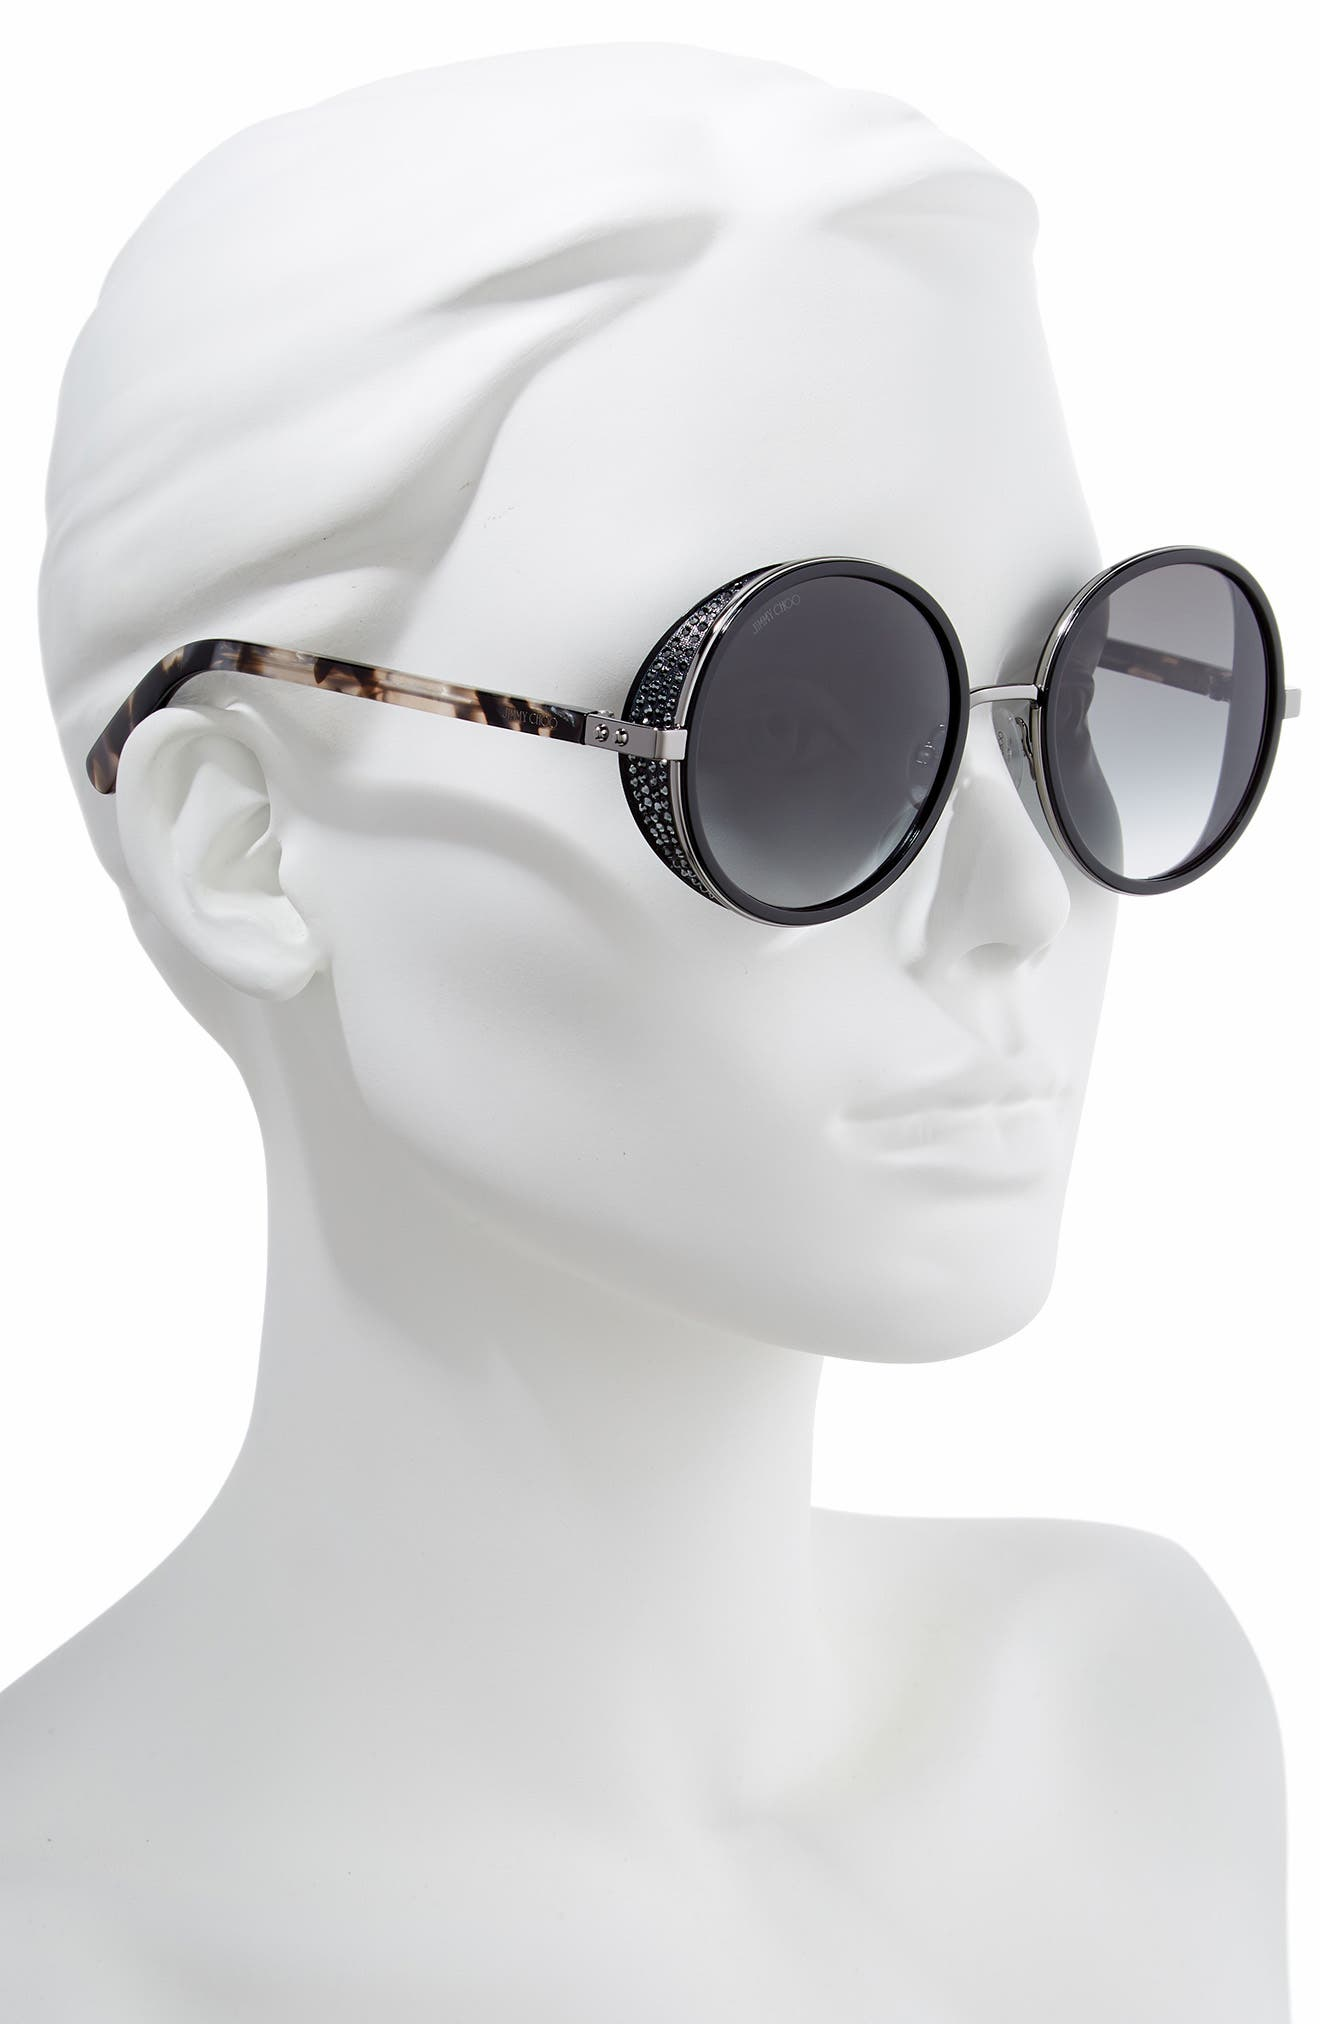 Andiens 54mm Round Sunglasses,                             Alternate thumbnail 2, color,                             BLACK